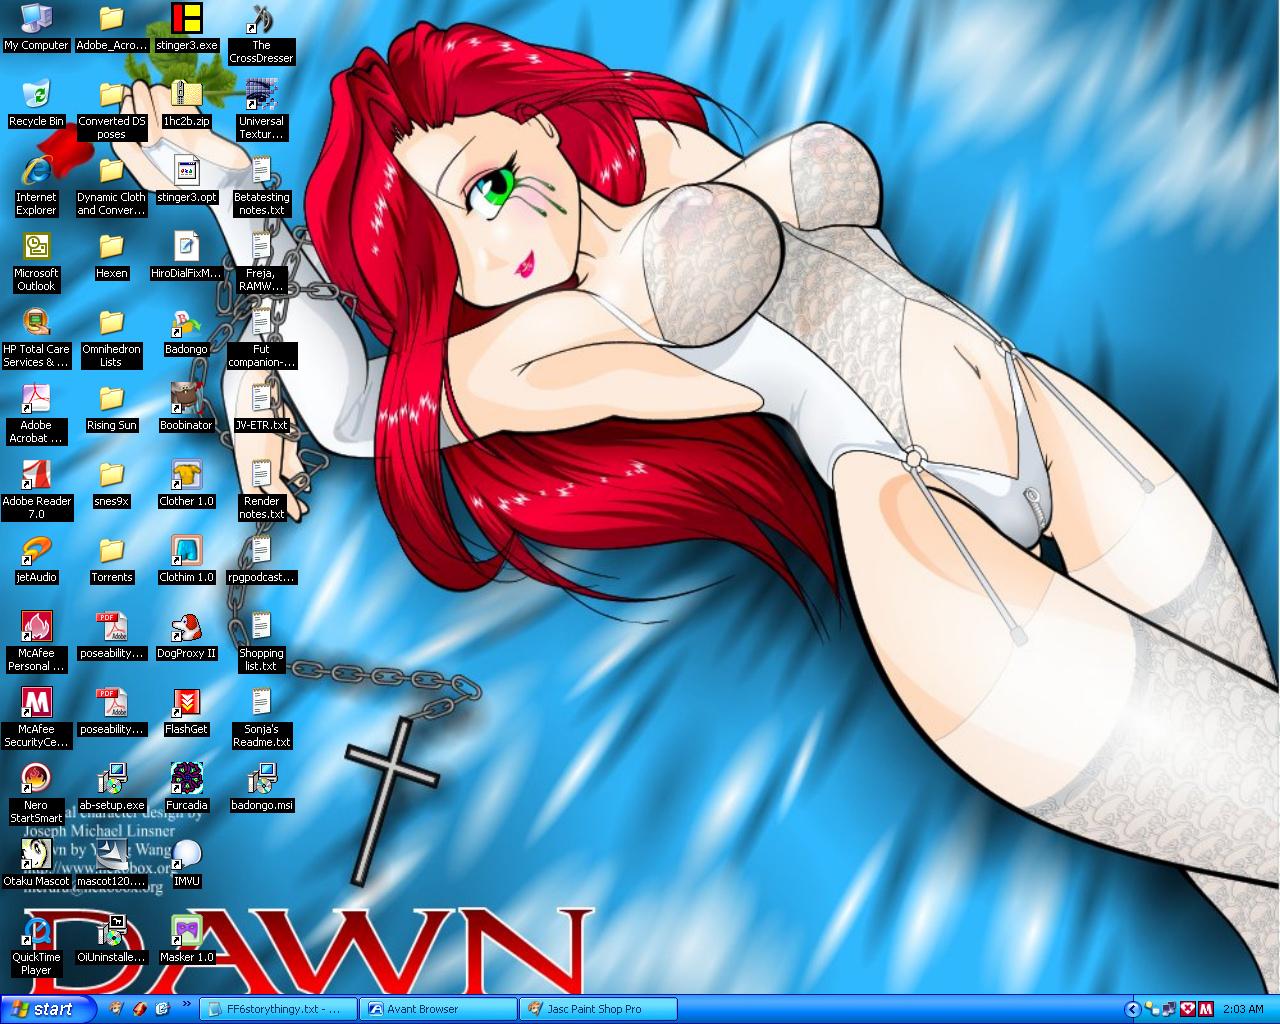 My Desktop by SilkaLiveDoll